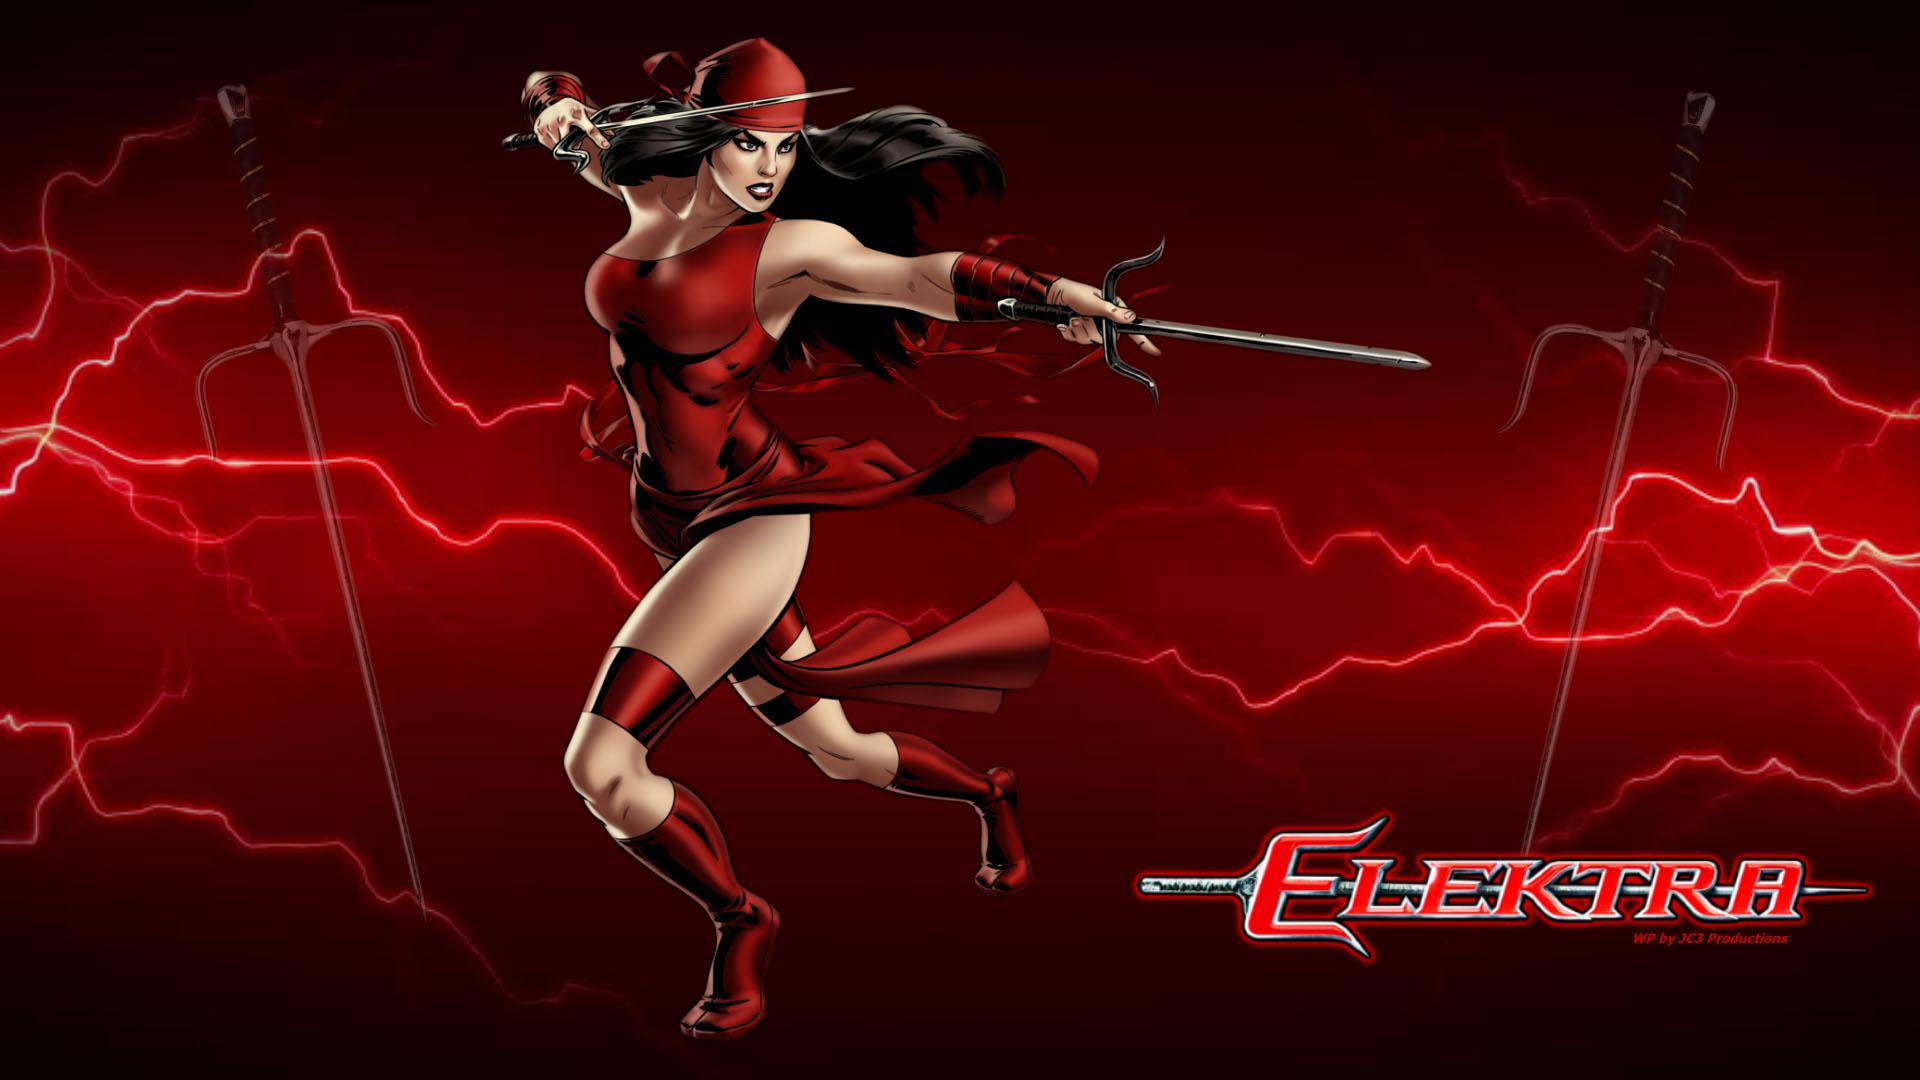 Elektra - Electric wallpaper. 2jpg by Curtdawg53